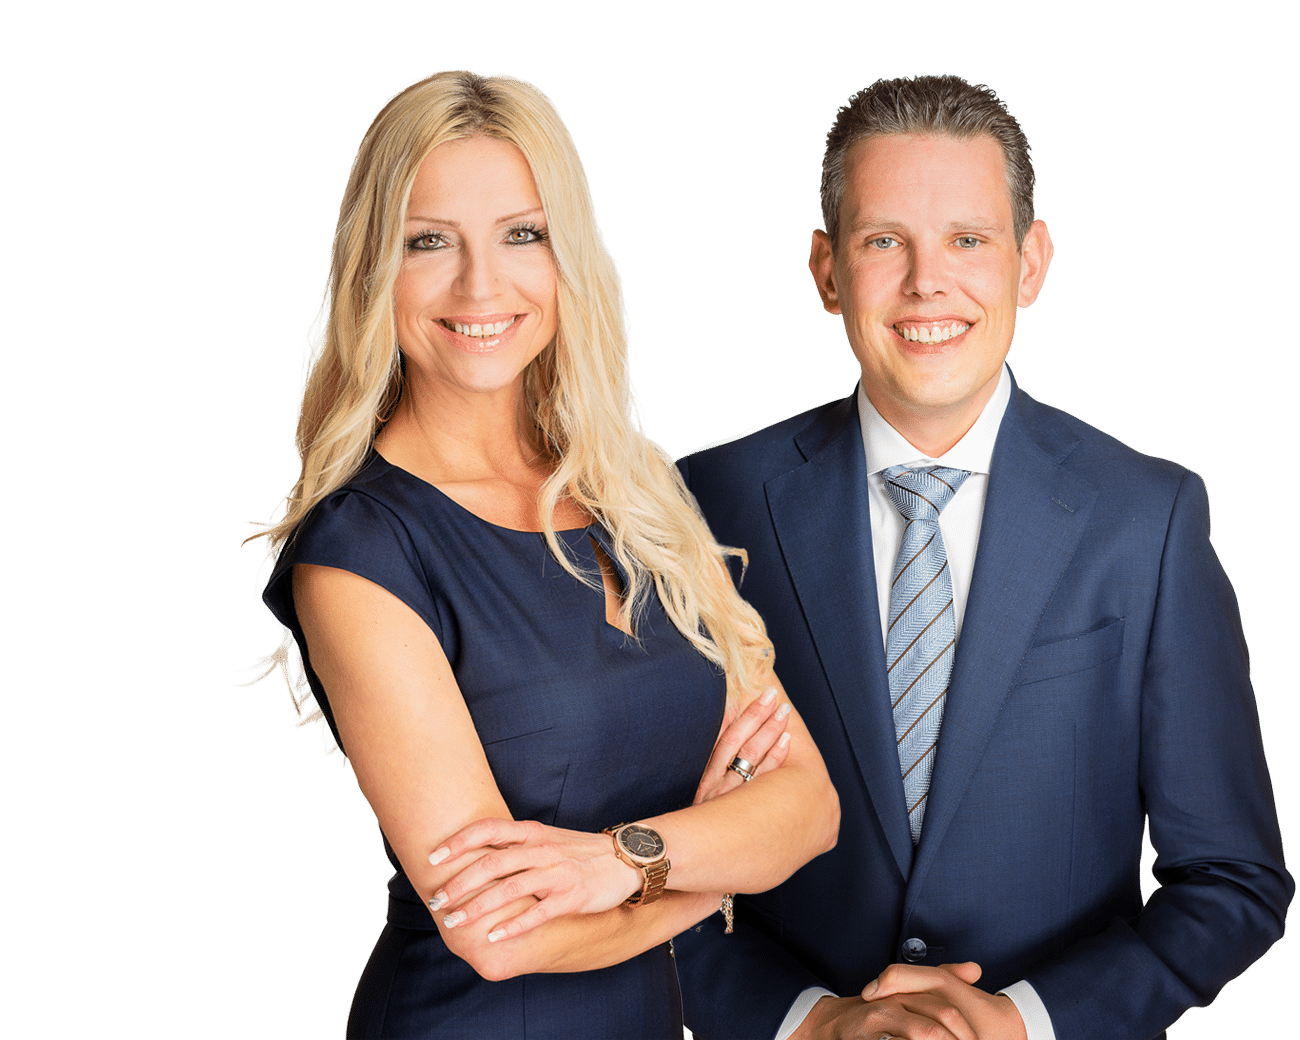 Michaela und Patrick Sachse - Immobilienmakler in Krefeld